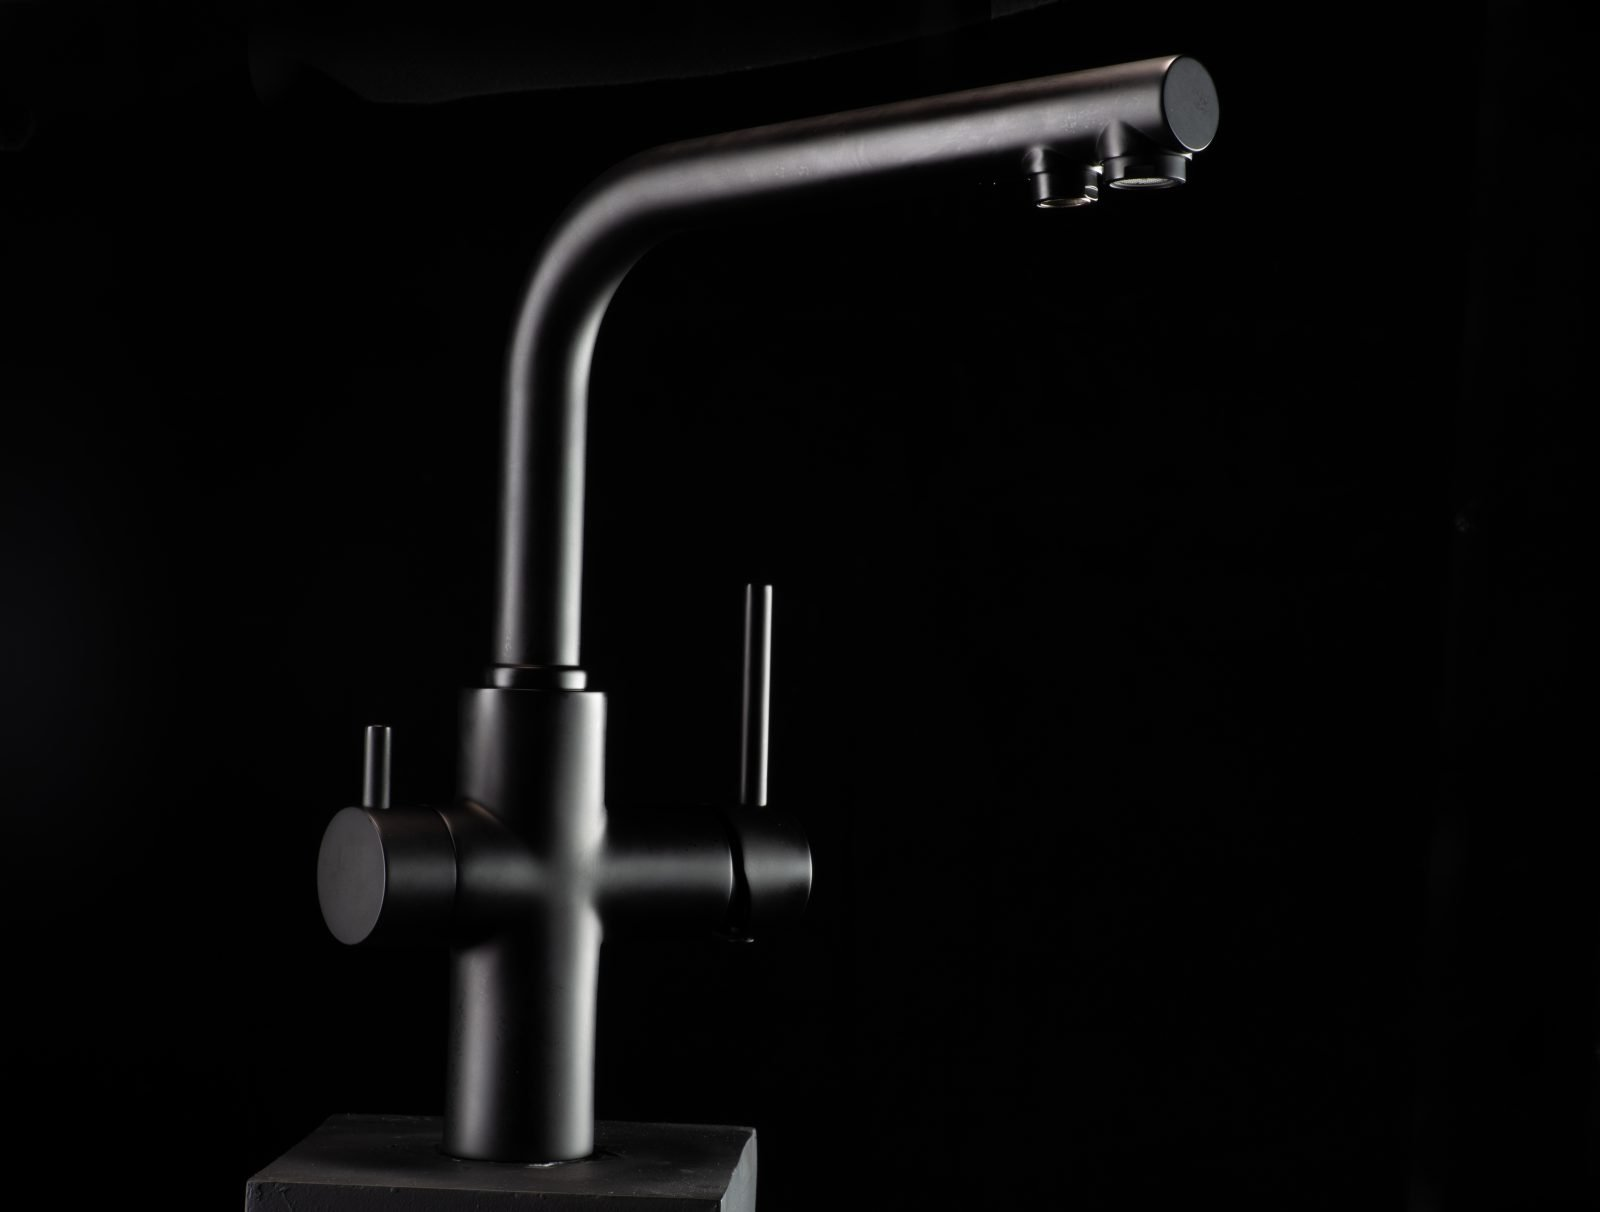 BP02 - Akwadott Black Dual function kitchen tap